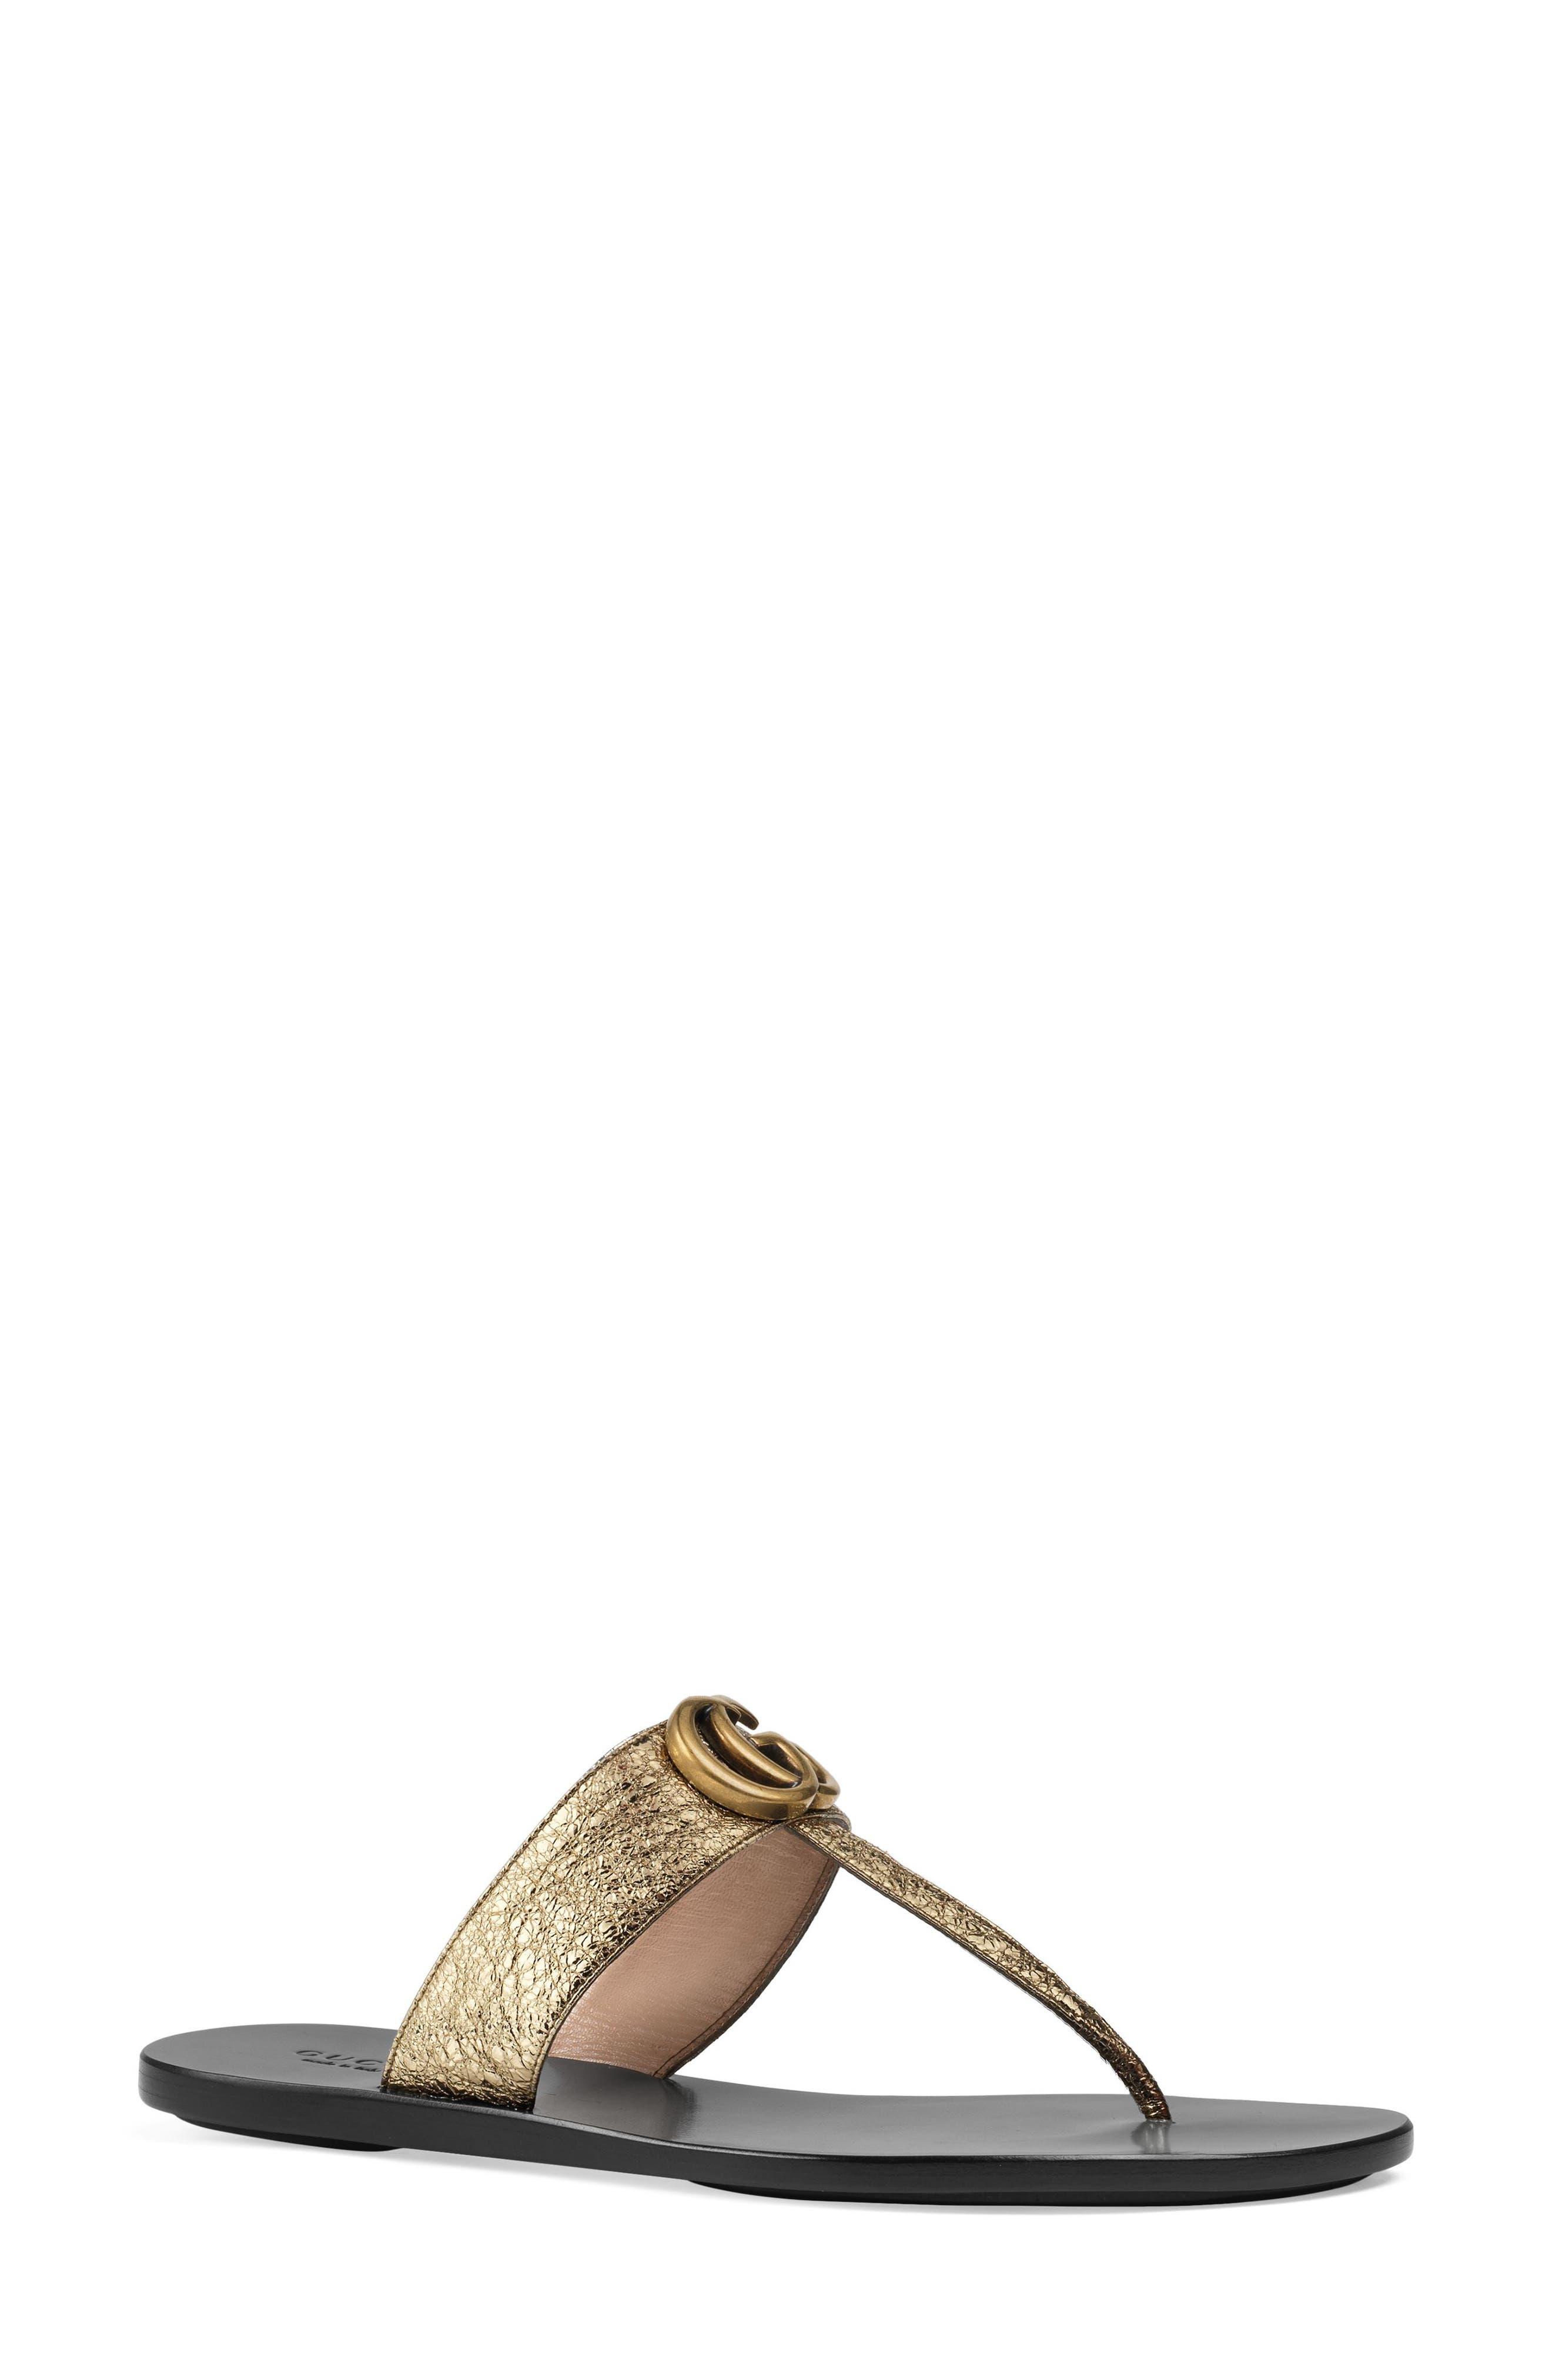 Alternate Image 1 Selected - Gucci Marmont T-Strap Sandal (Women)